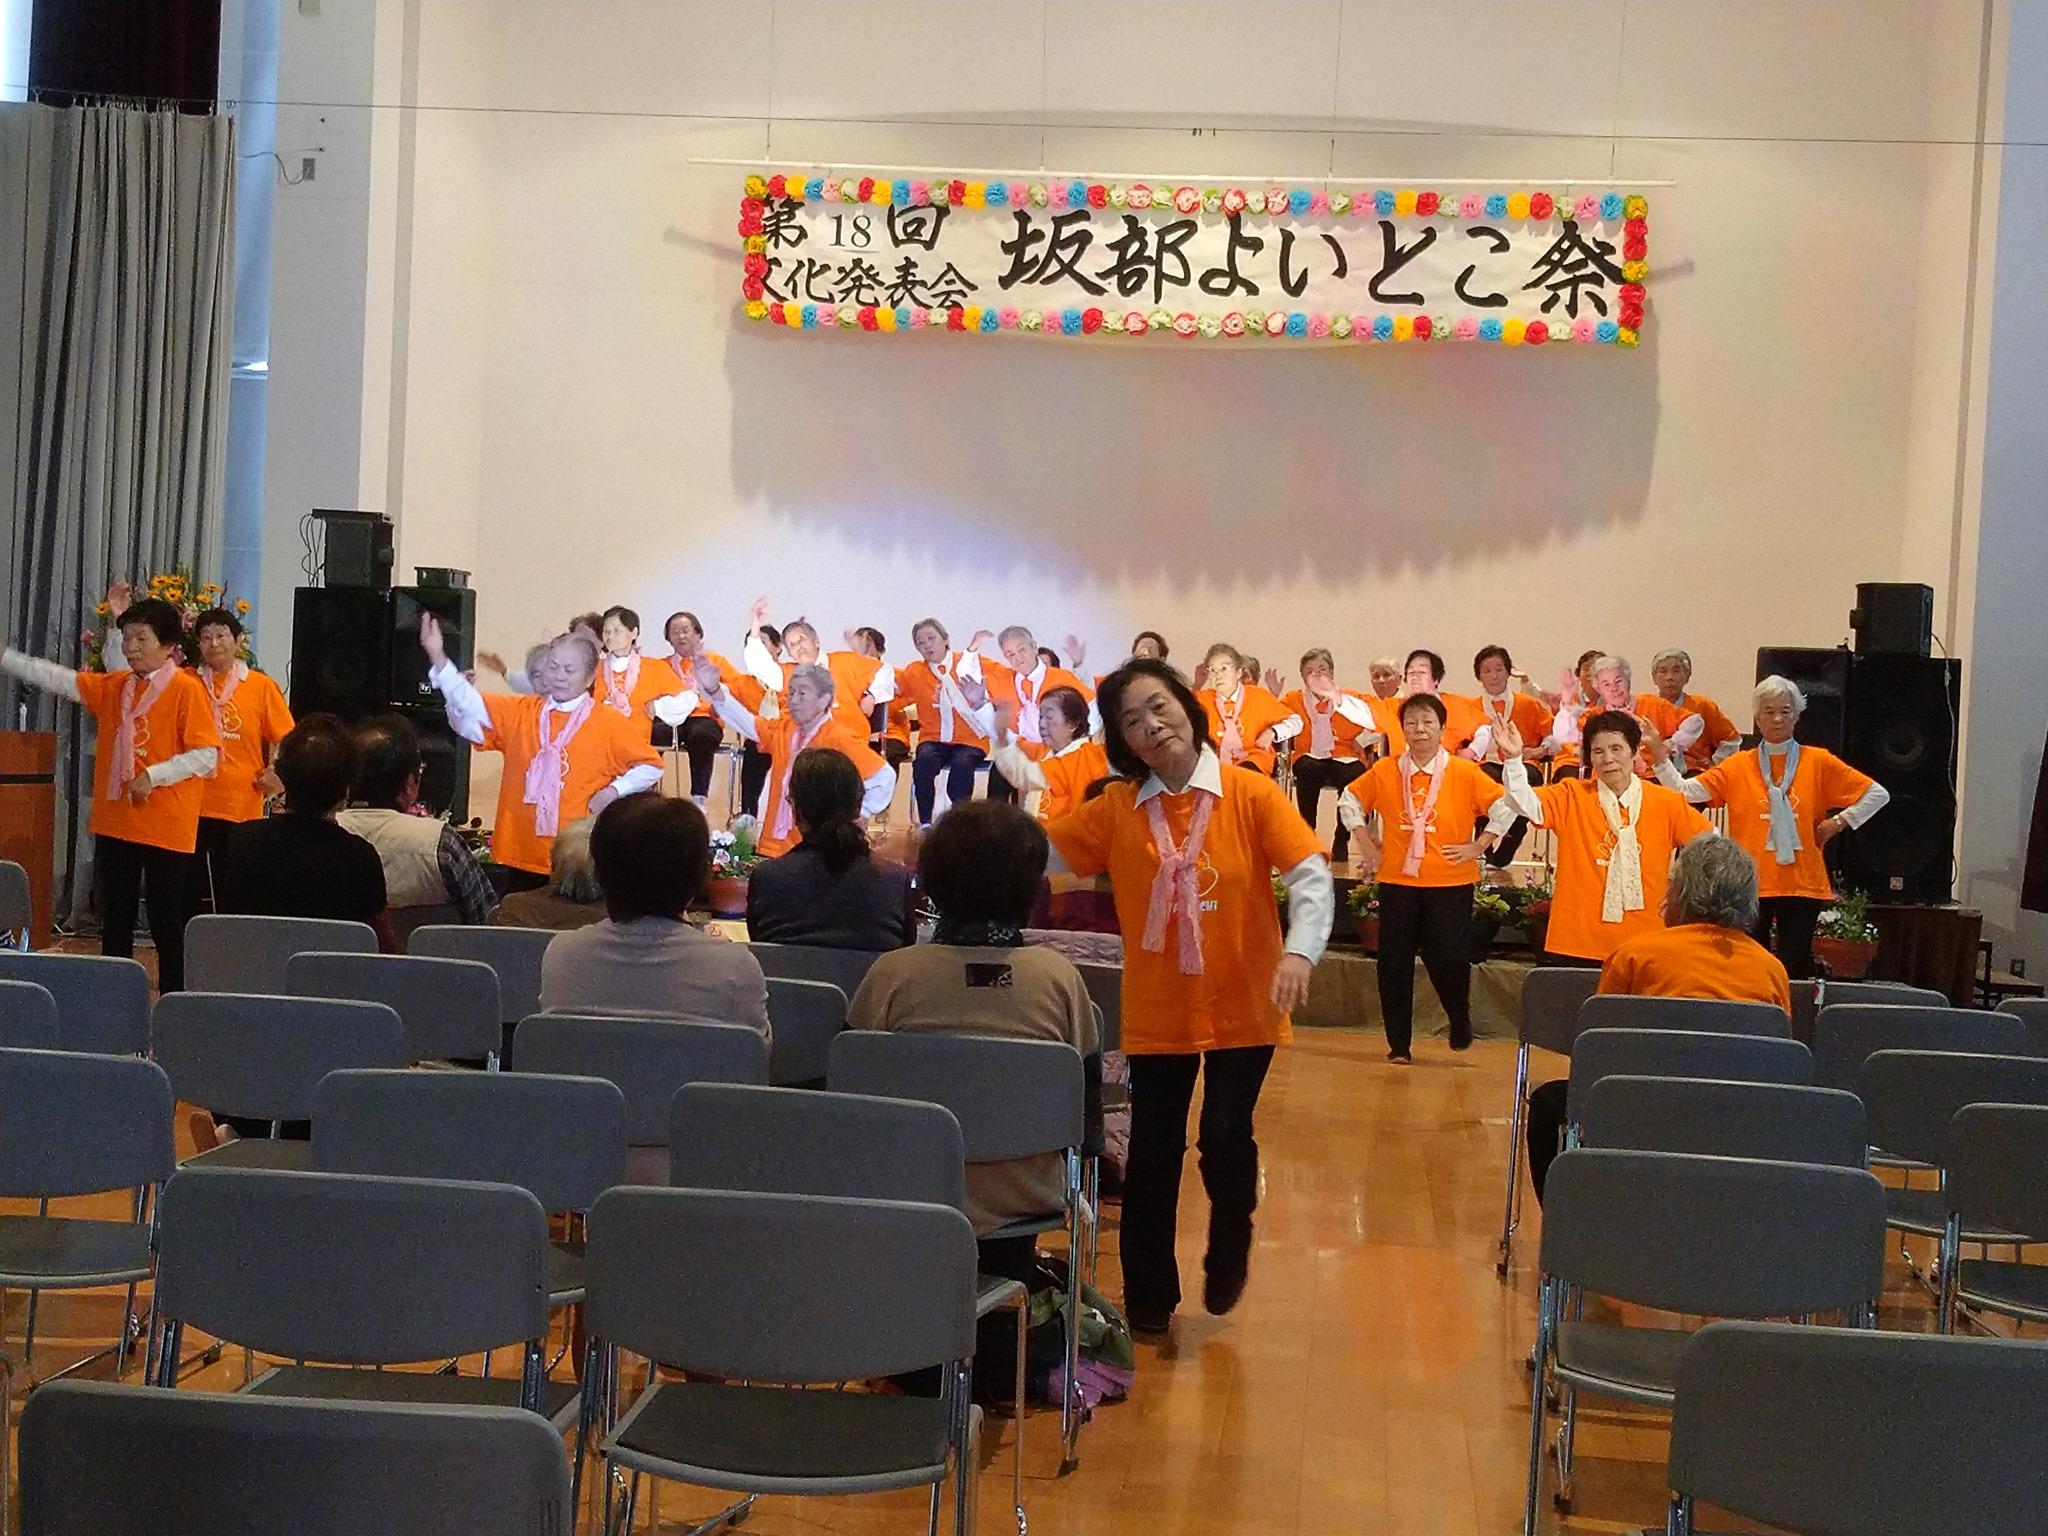 fureai-yoitoko-2019-2.jpg